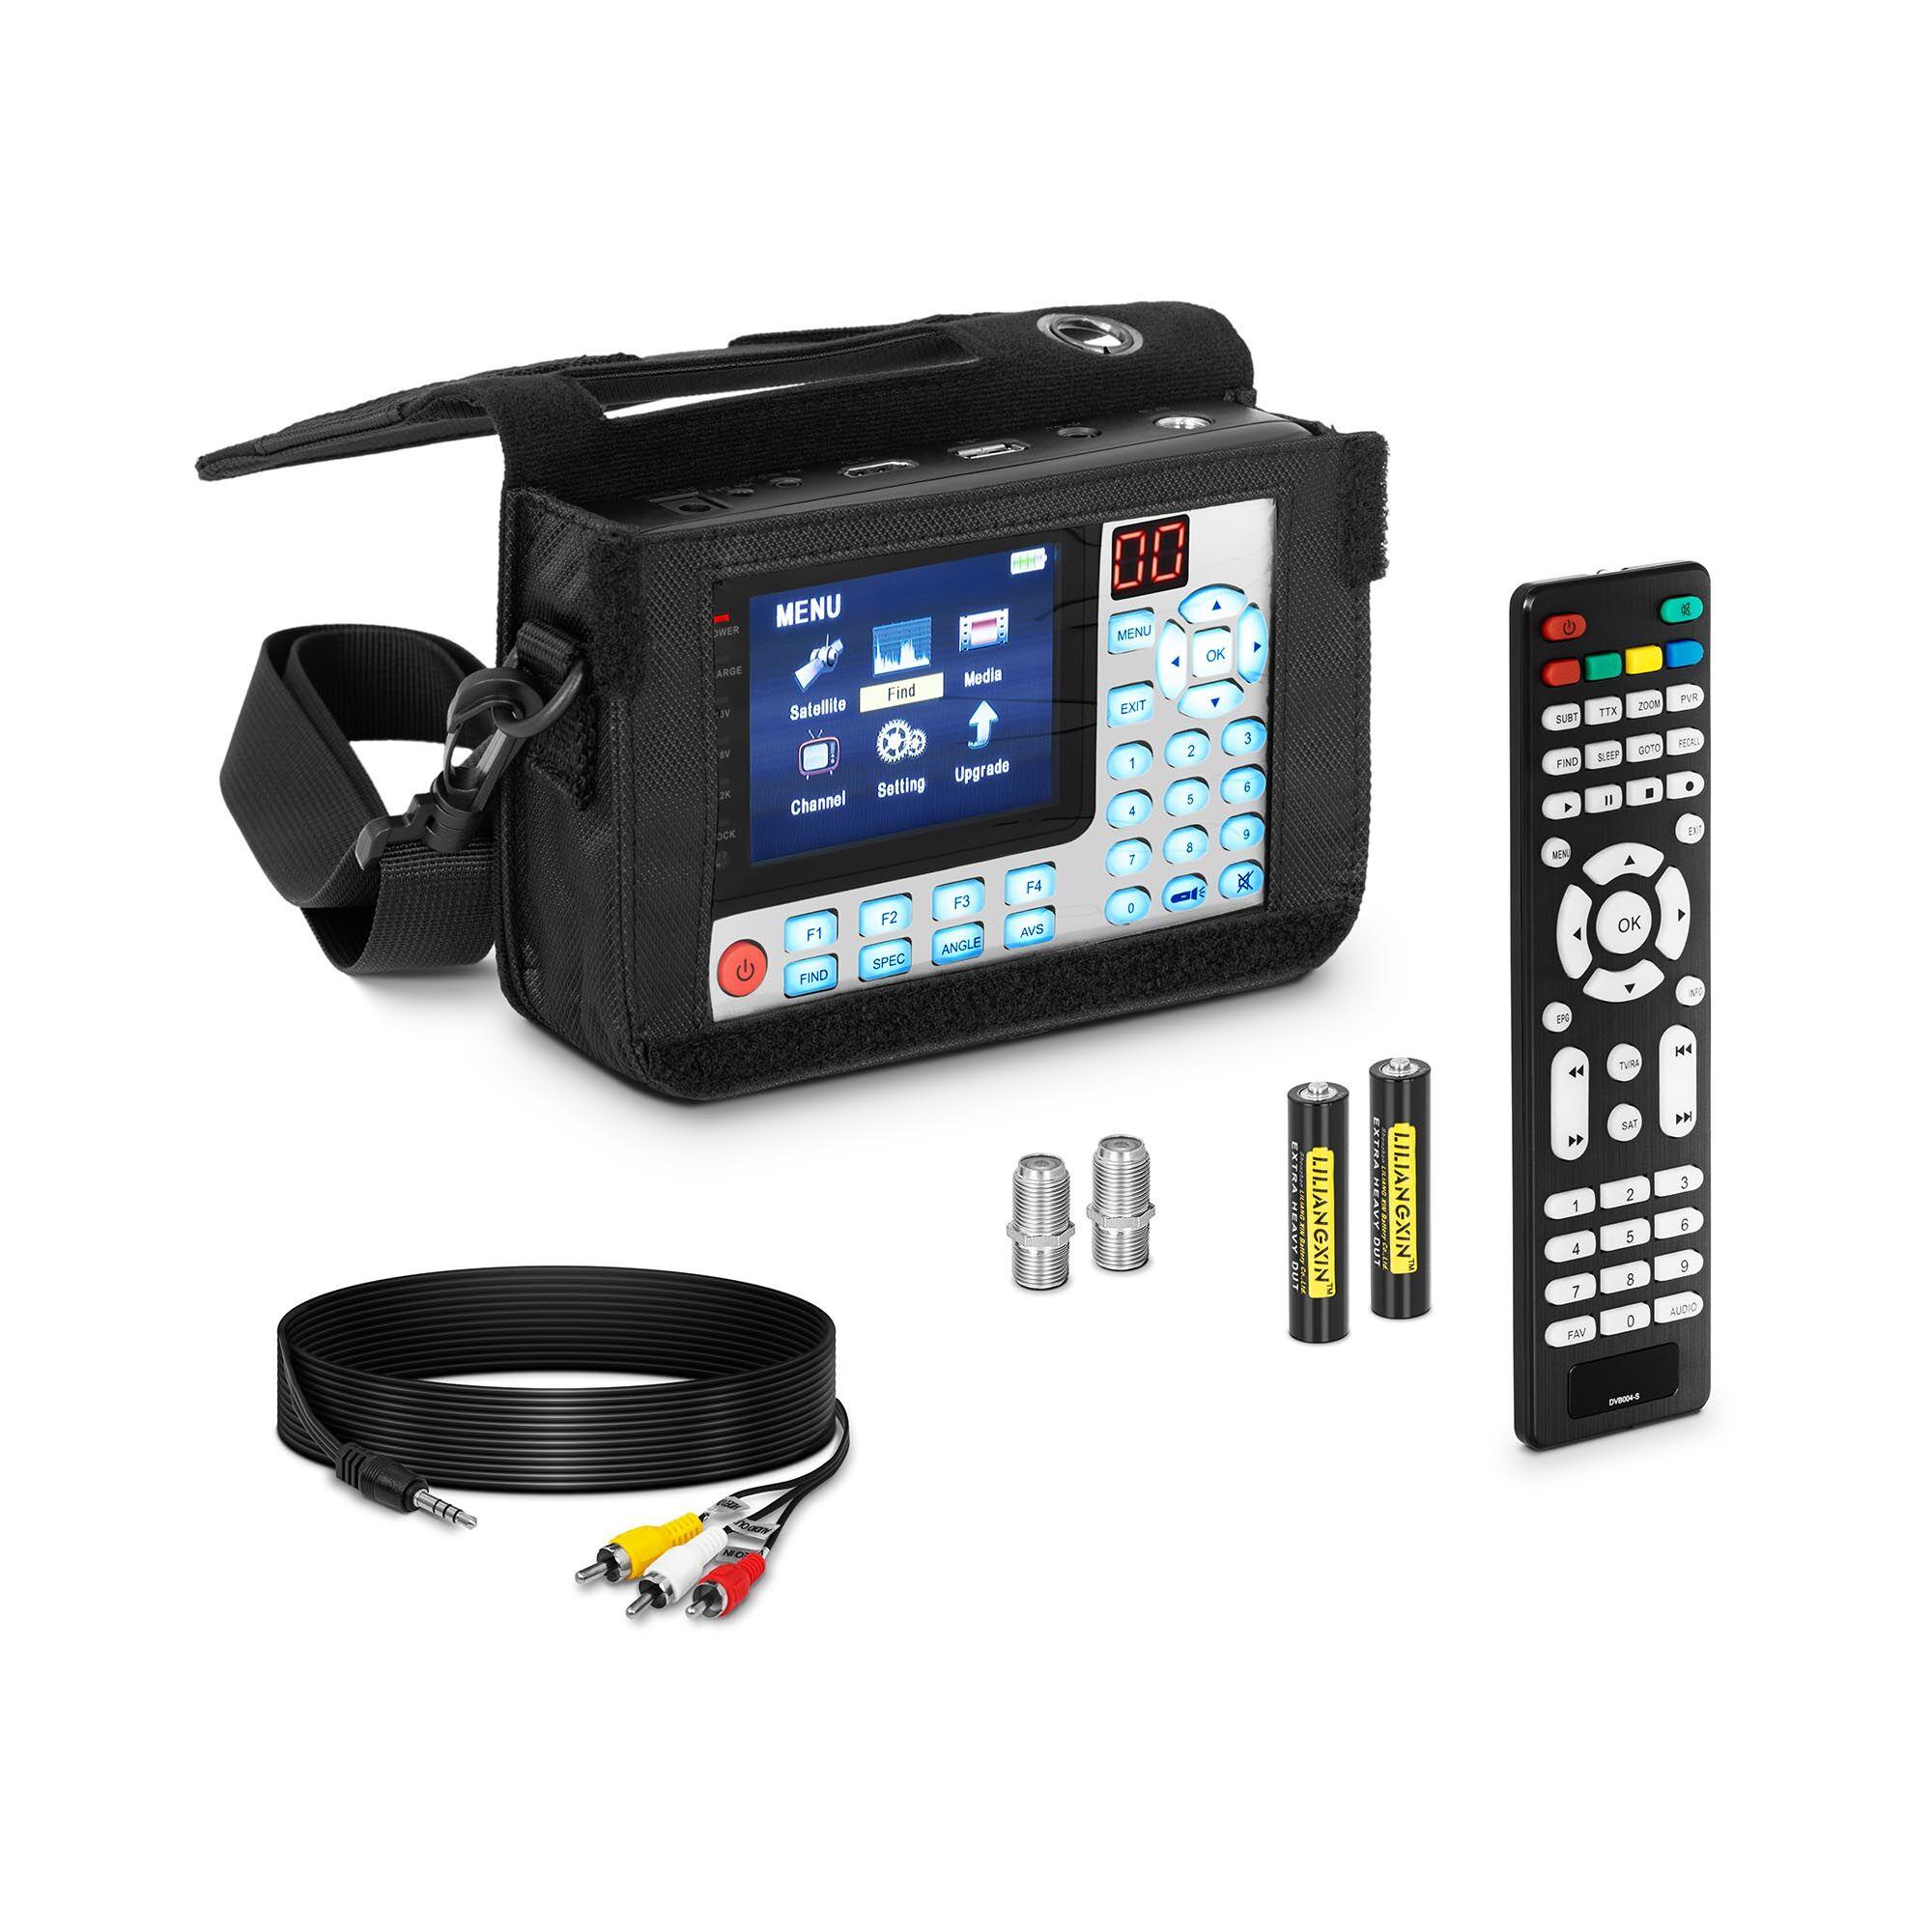 pixel timer remote control wireless tw 282 s2